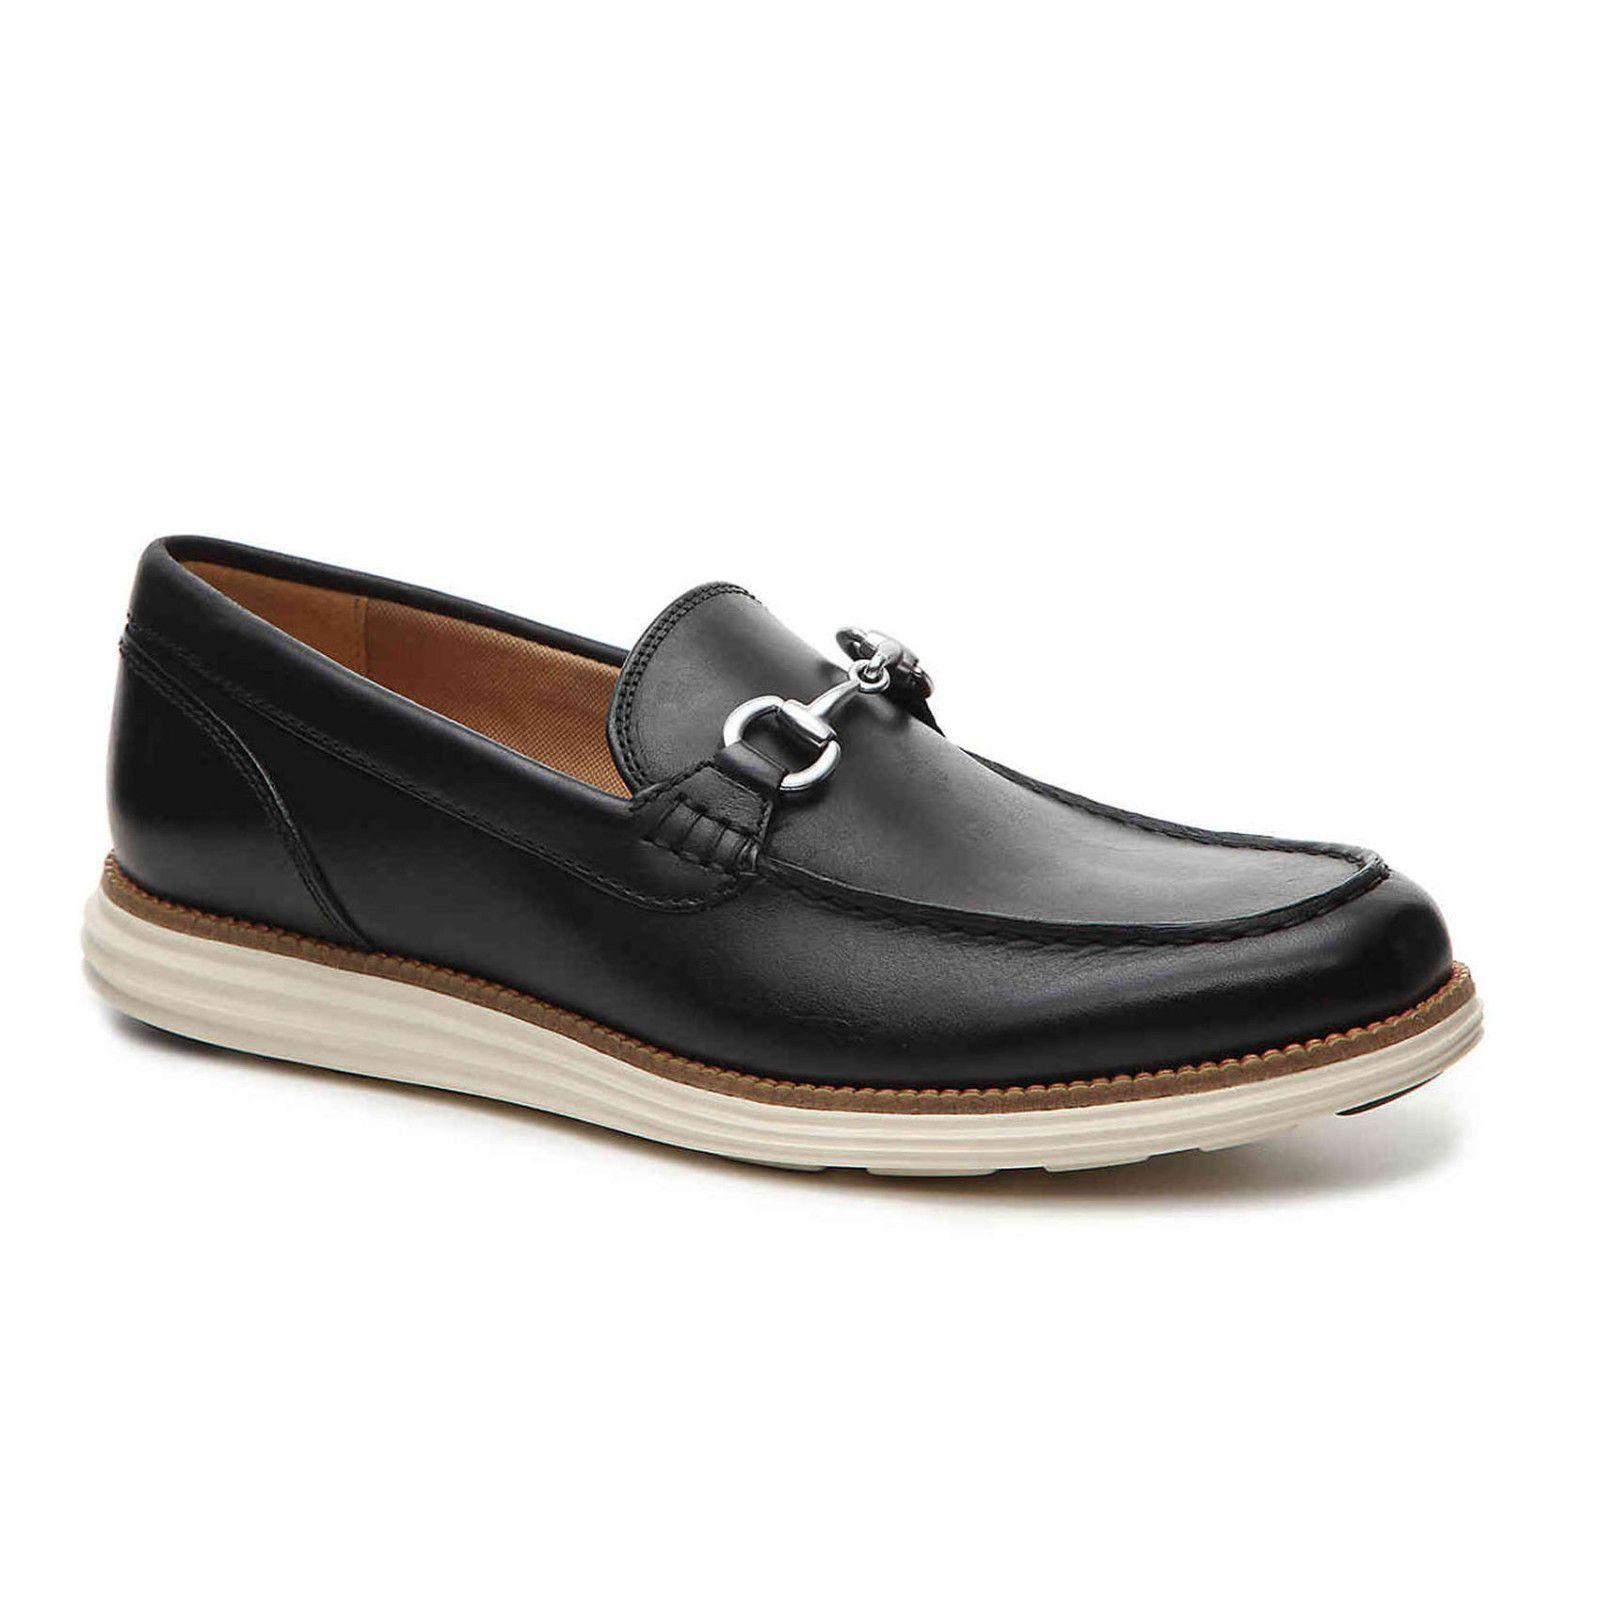 11fb95161f Fashion Sale, Men Fashion, Cool Sunglasses, Cole Haan, Sperrys, Boat Shoes